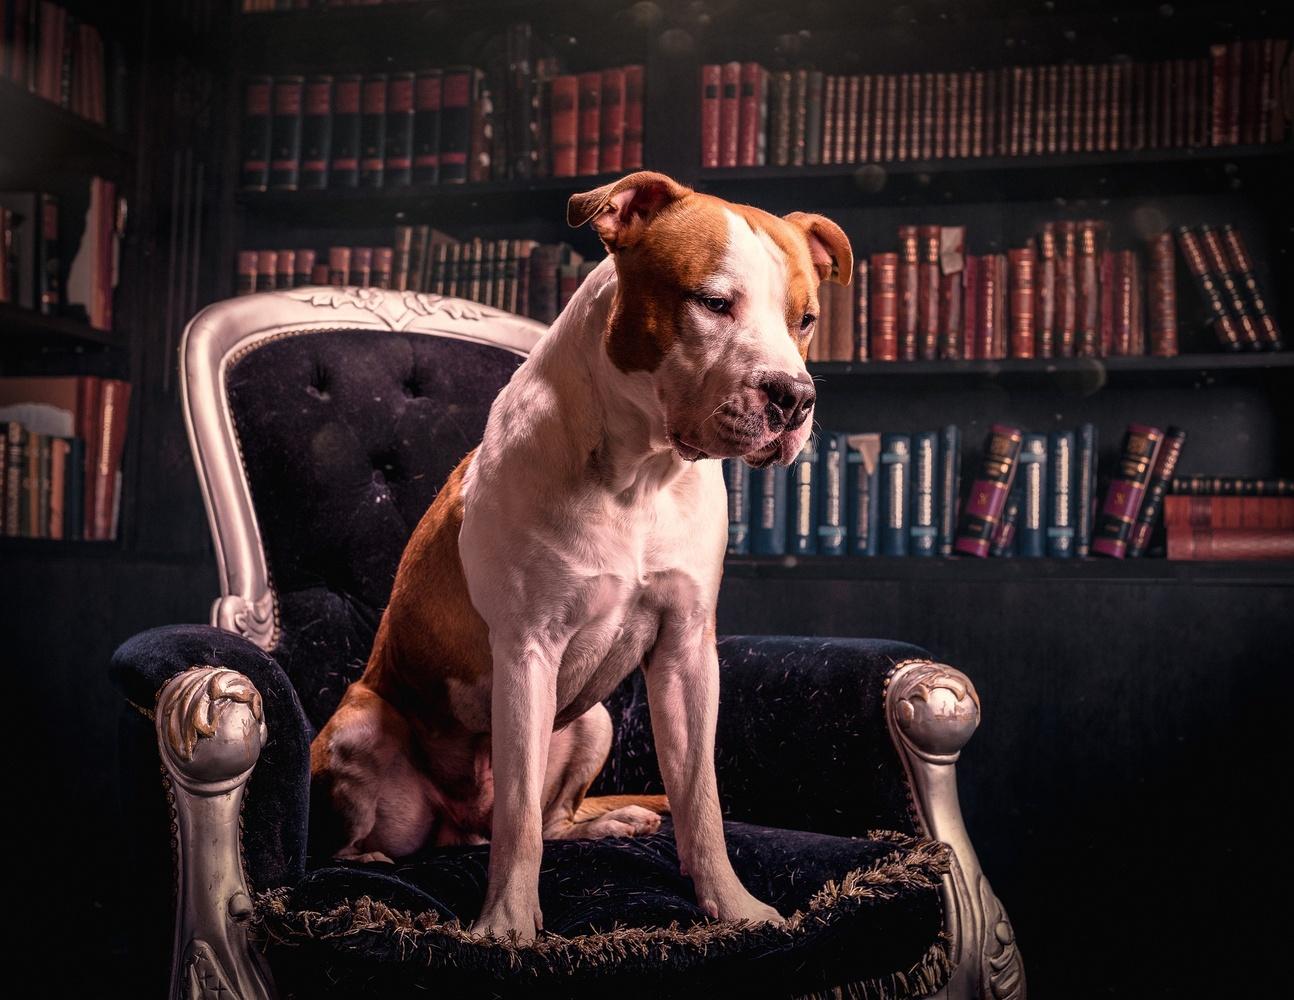 Library dog by Juhamatti Vahdersalo